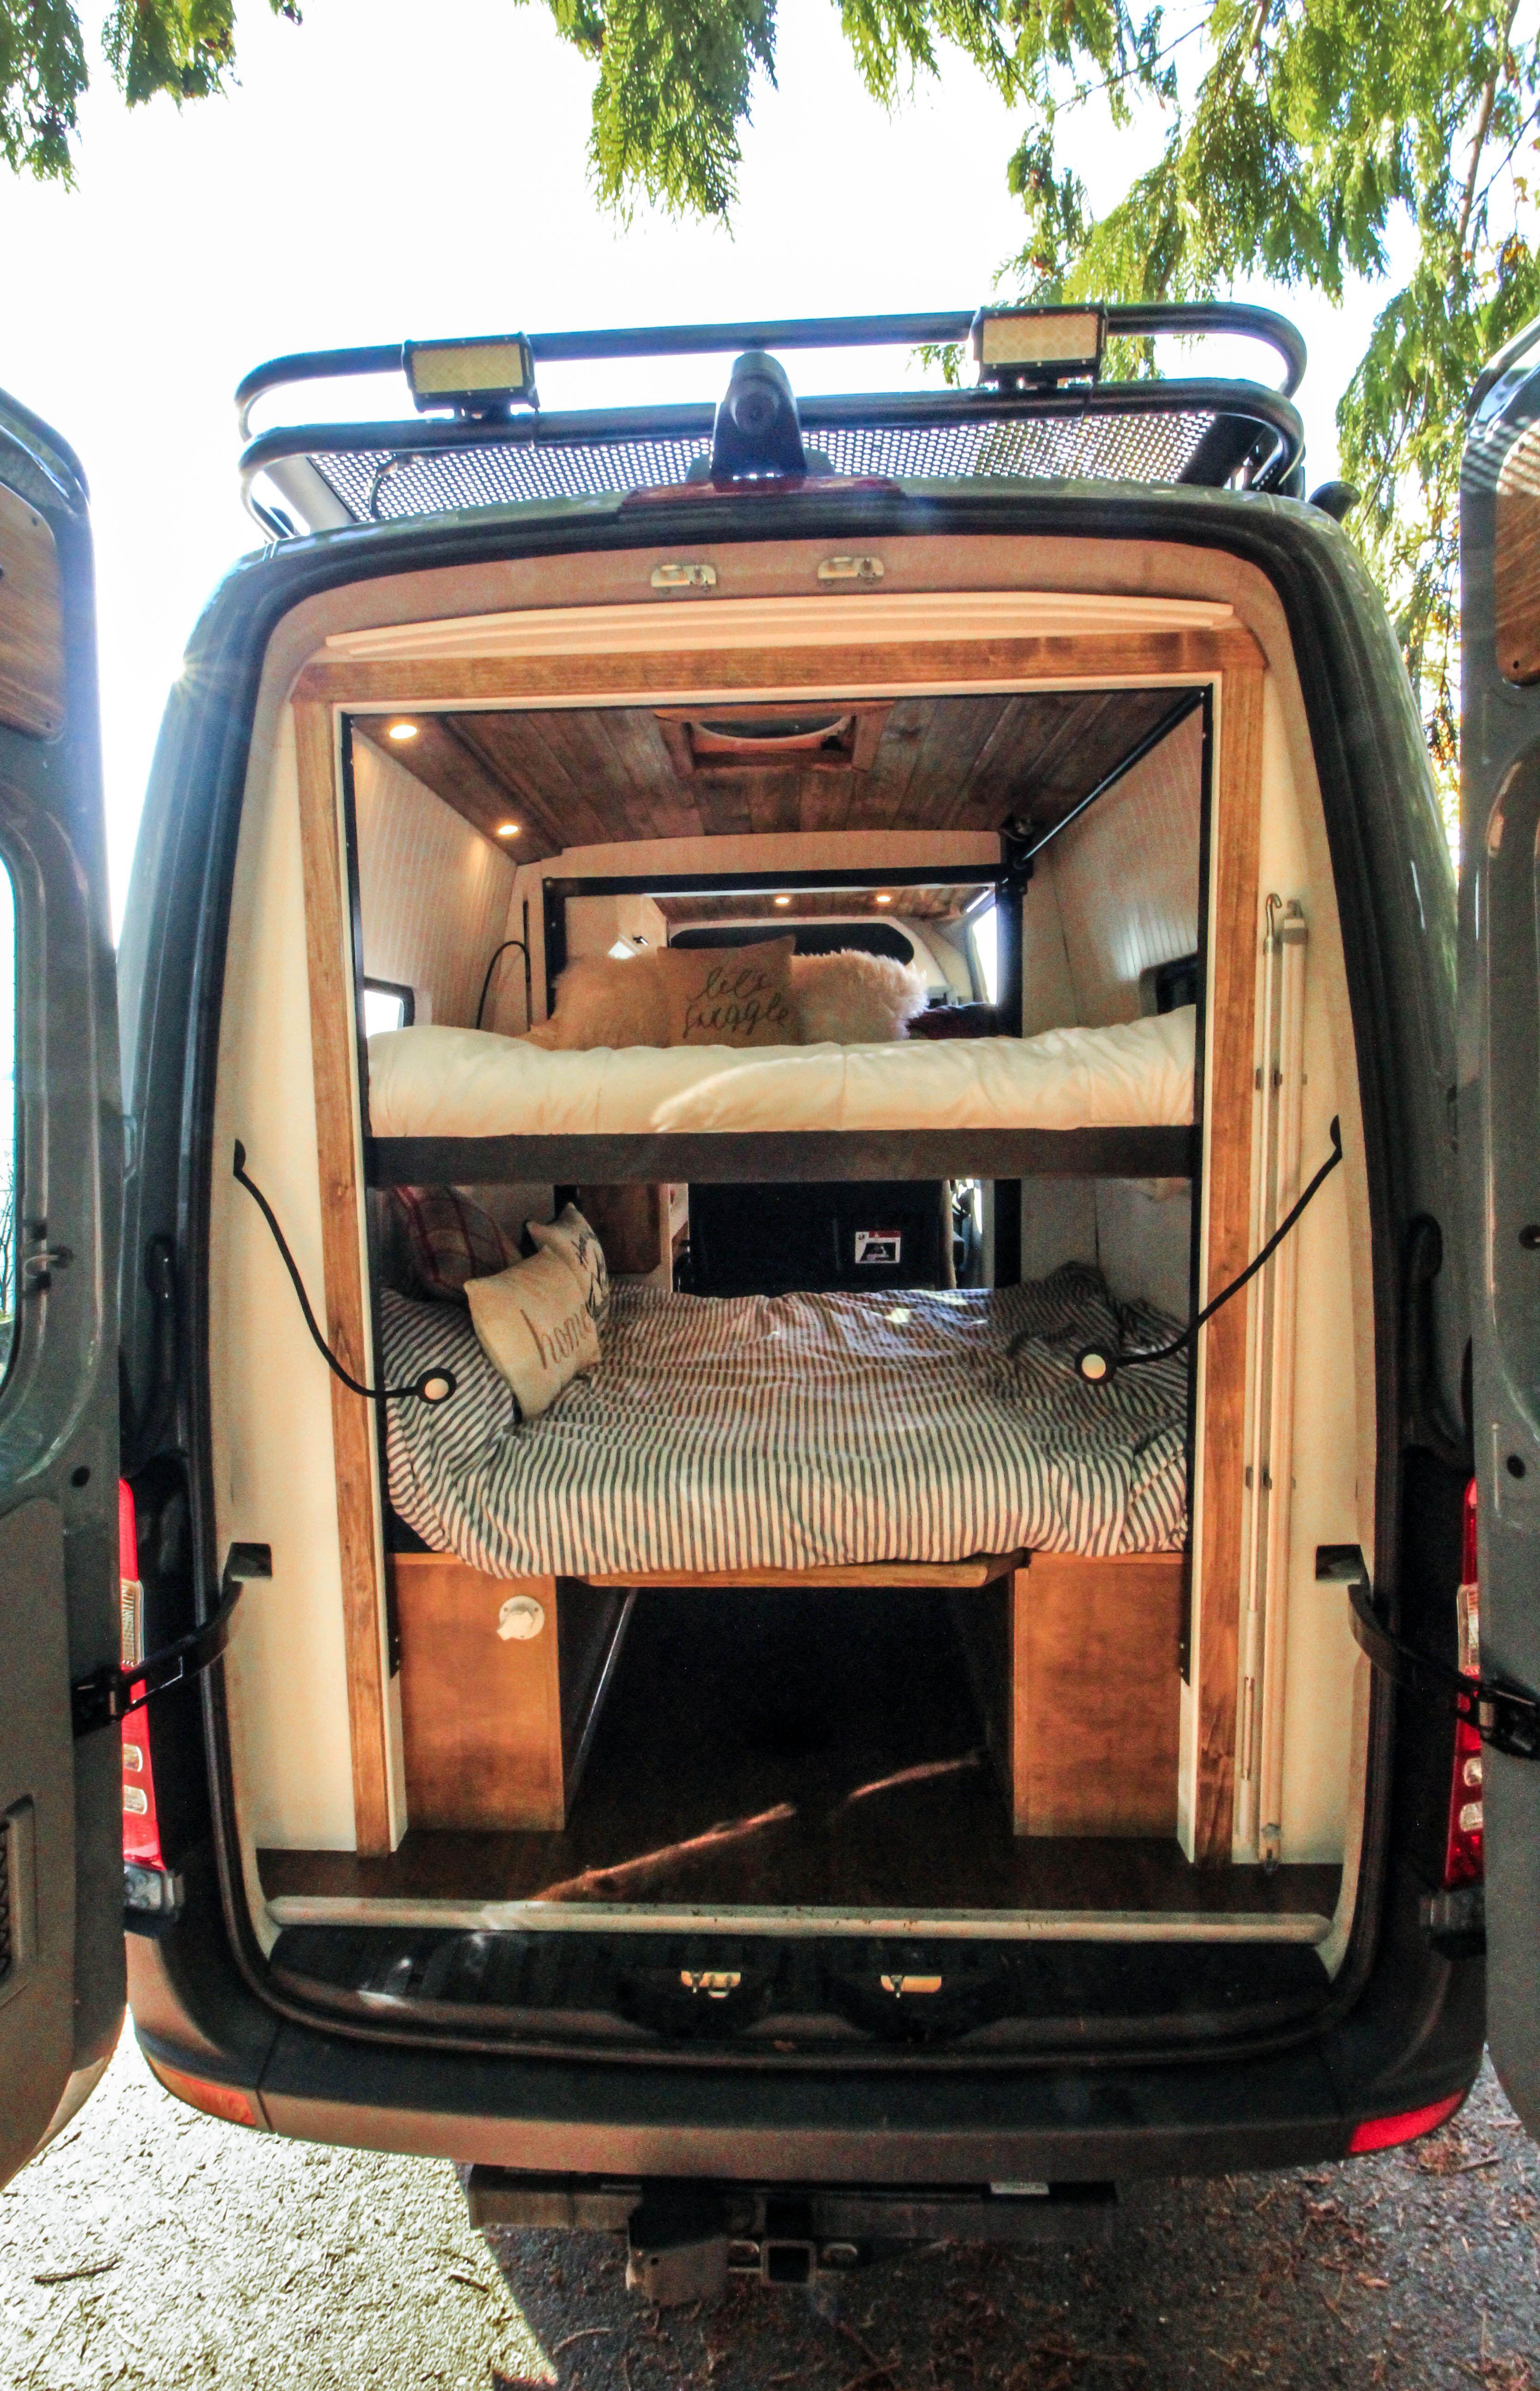 The Family Van Conversion Freedom Vans Van Life Diy Van Life Van Conversion Interior